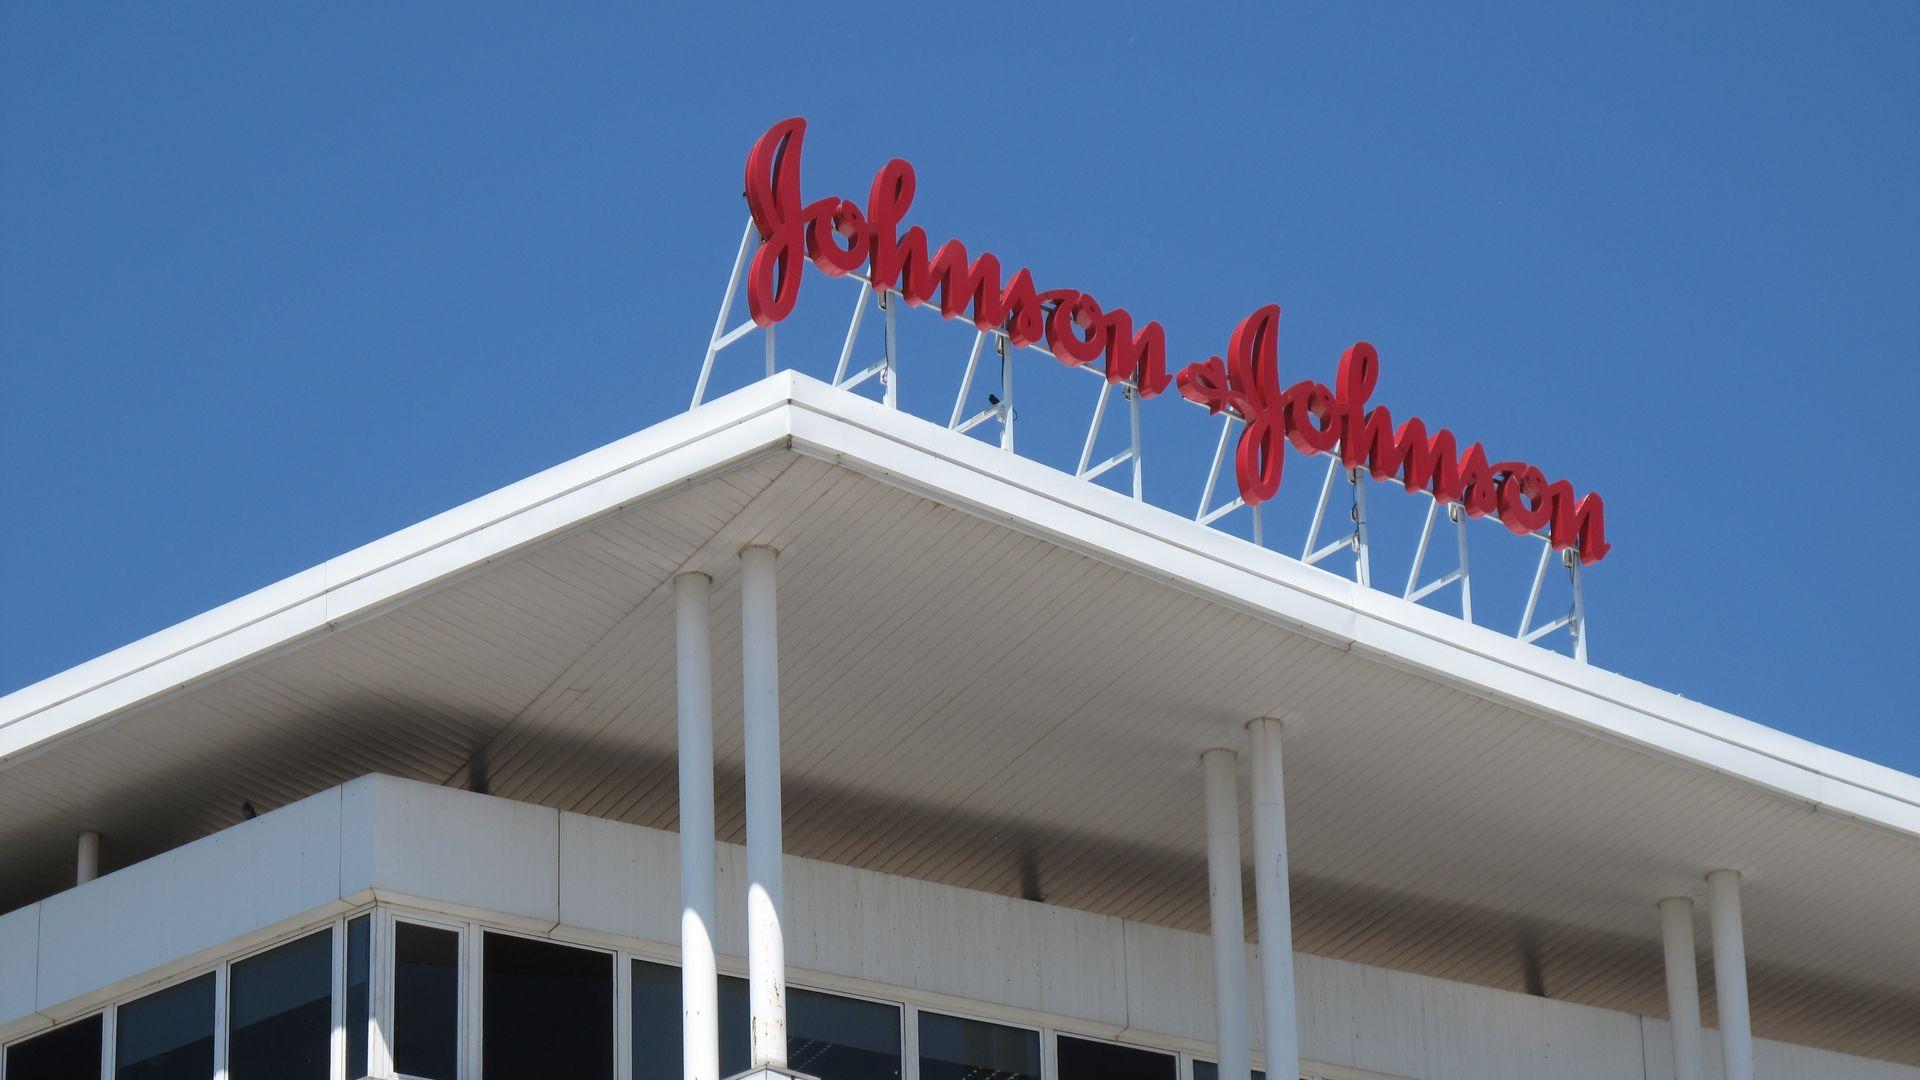 Johnson & Johnson logo on top of a building.